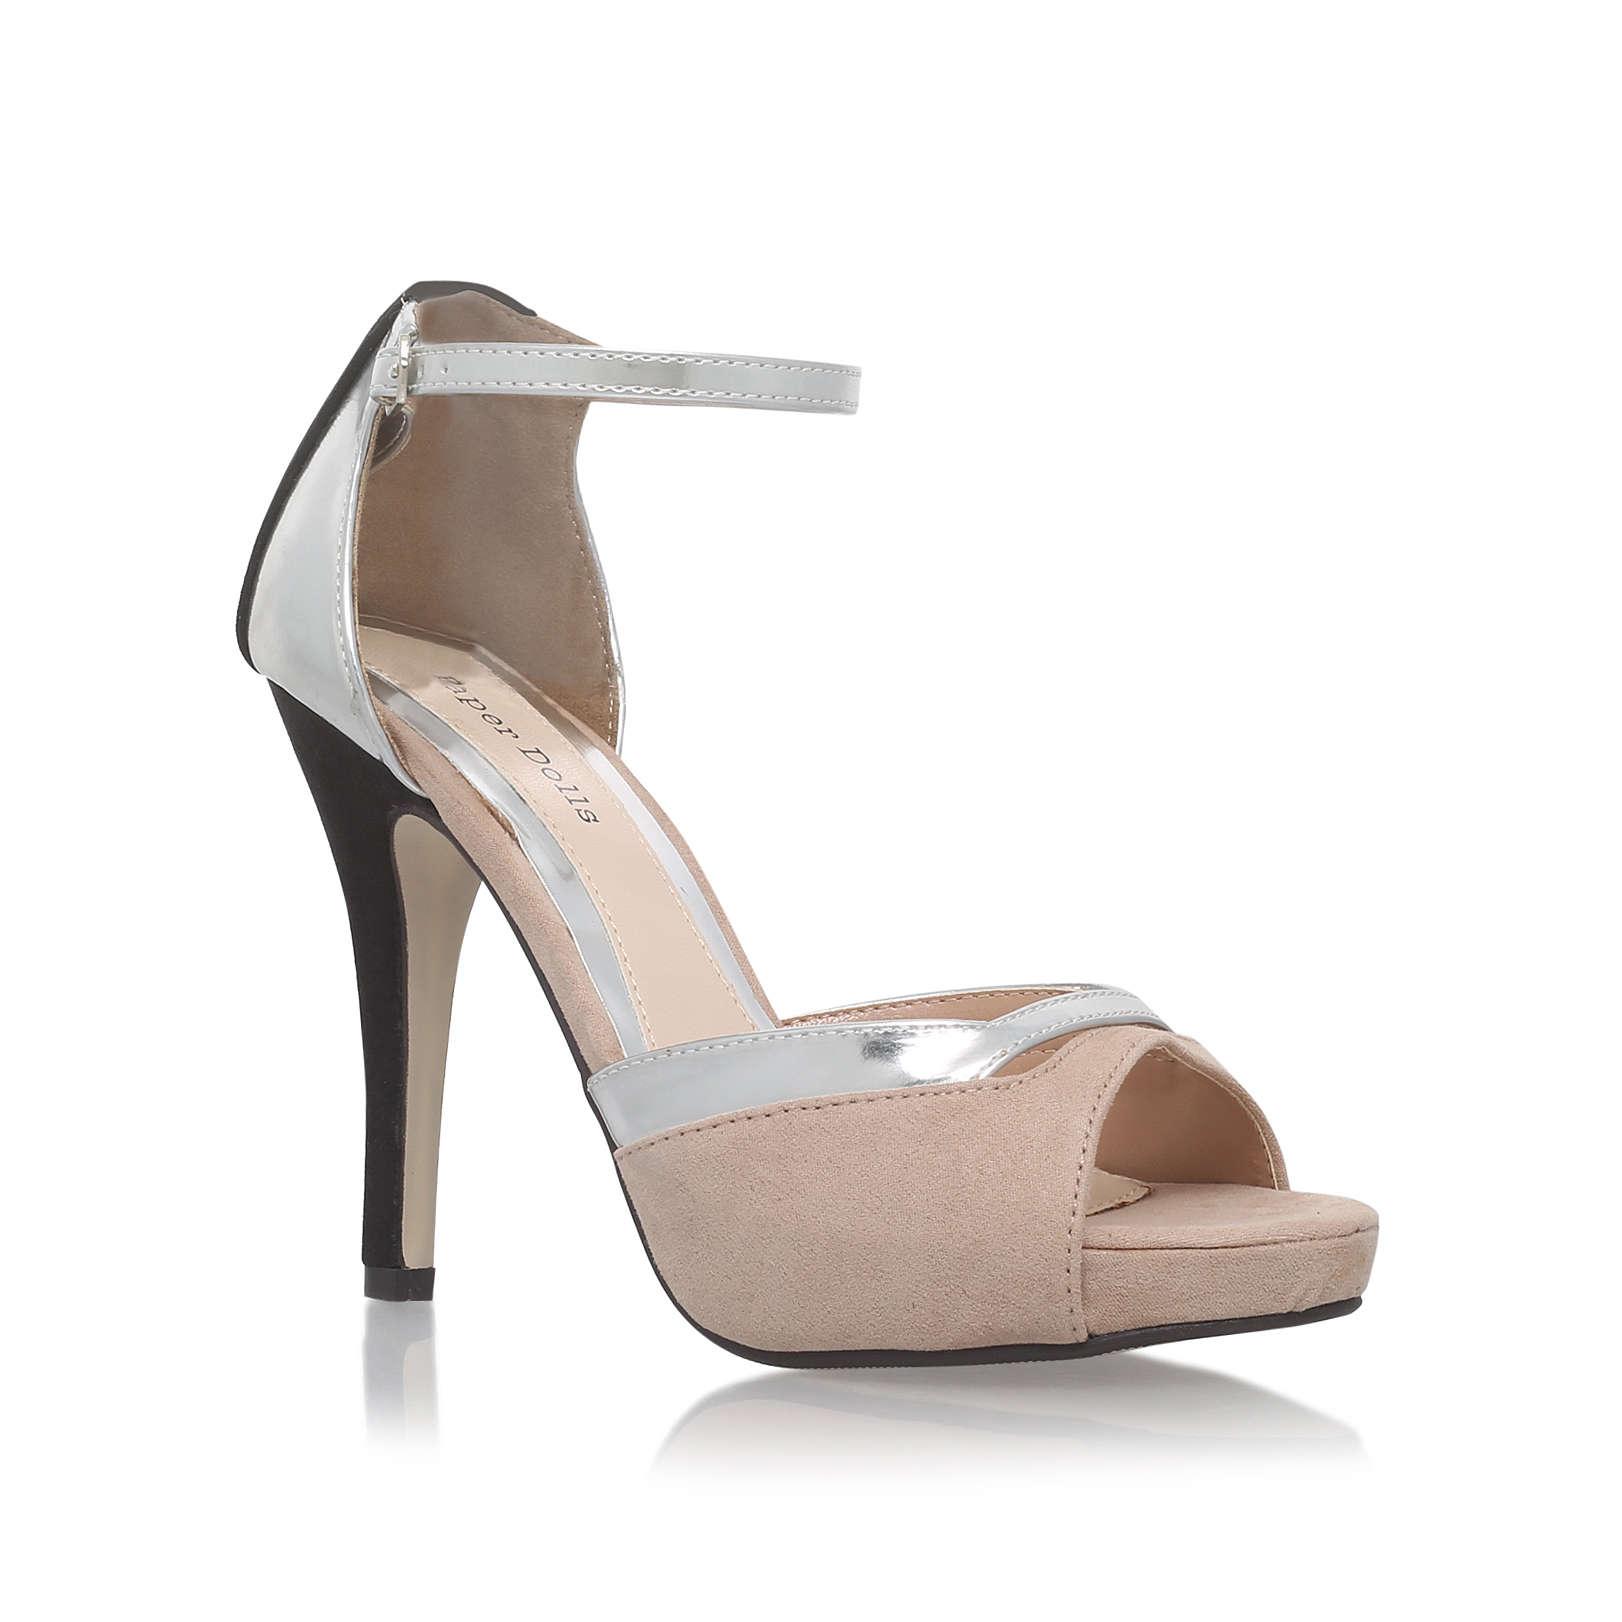 josie paper dolls josie beige high heel occasion shoes by paper dolls. Black Bedroom Furniture Sets. Home Design Ideas